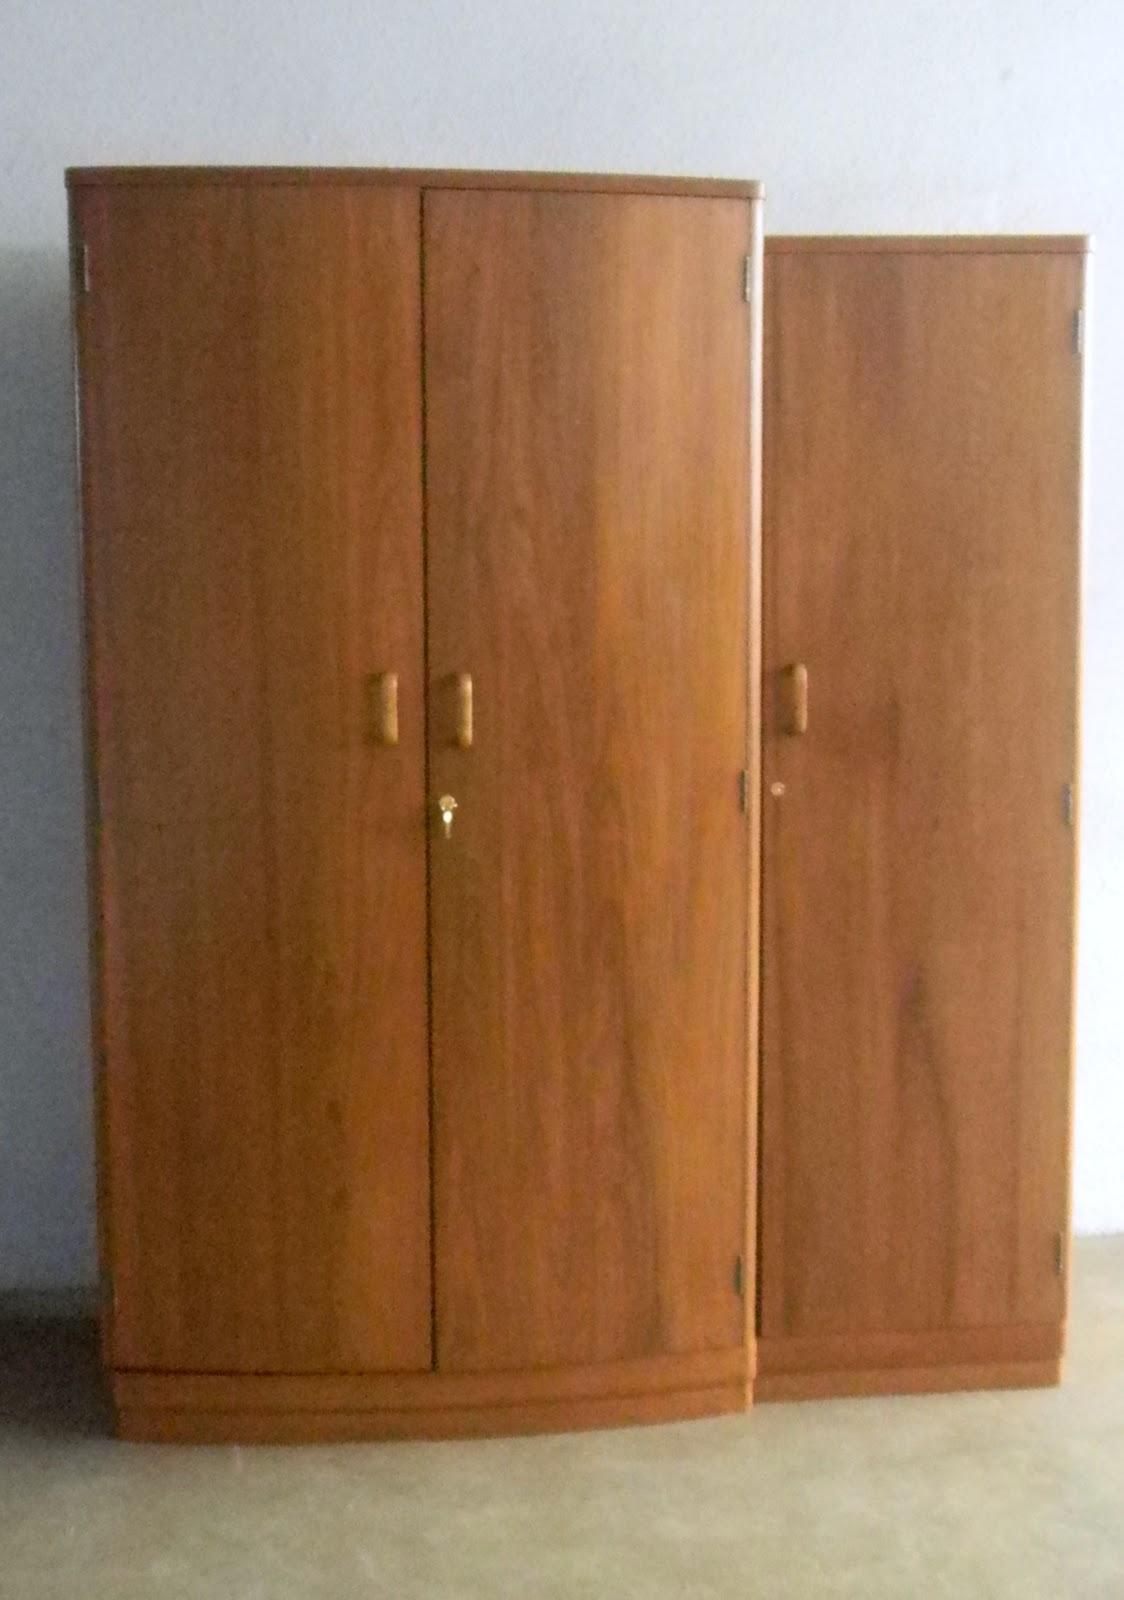 http://4.bp.blogspot.com/-cK_ZtRWAwUw/UNgULe3TXQI/AAAAAAAANlk/HdrVkIQ4V54/s1600/wardrobe+3-+door+art+deco+2.JPG